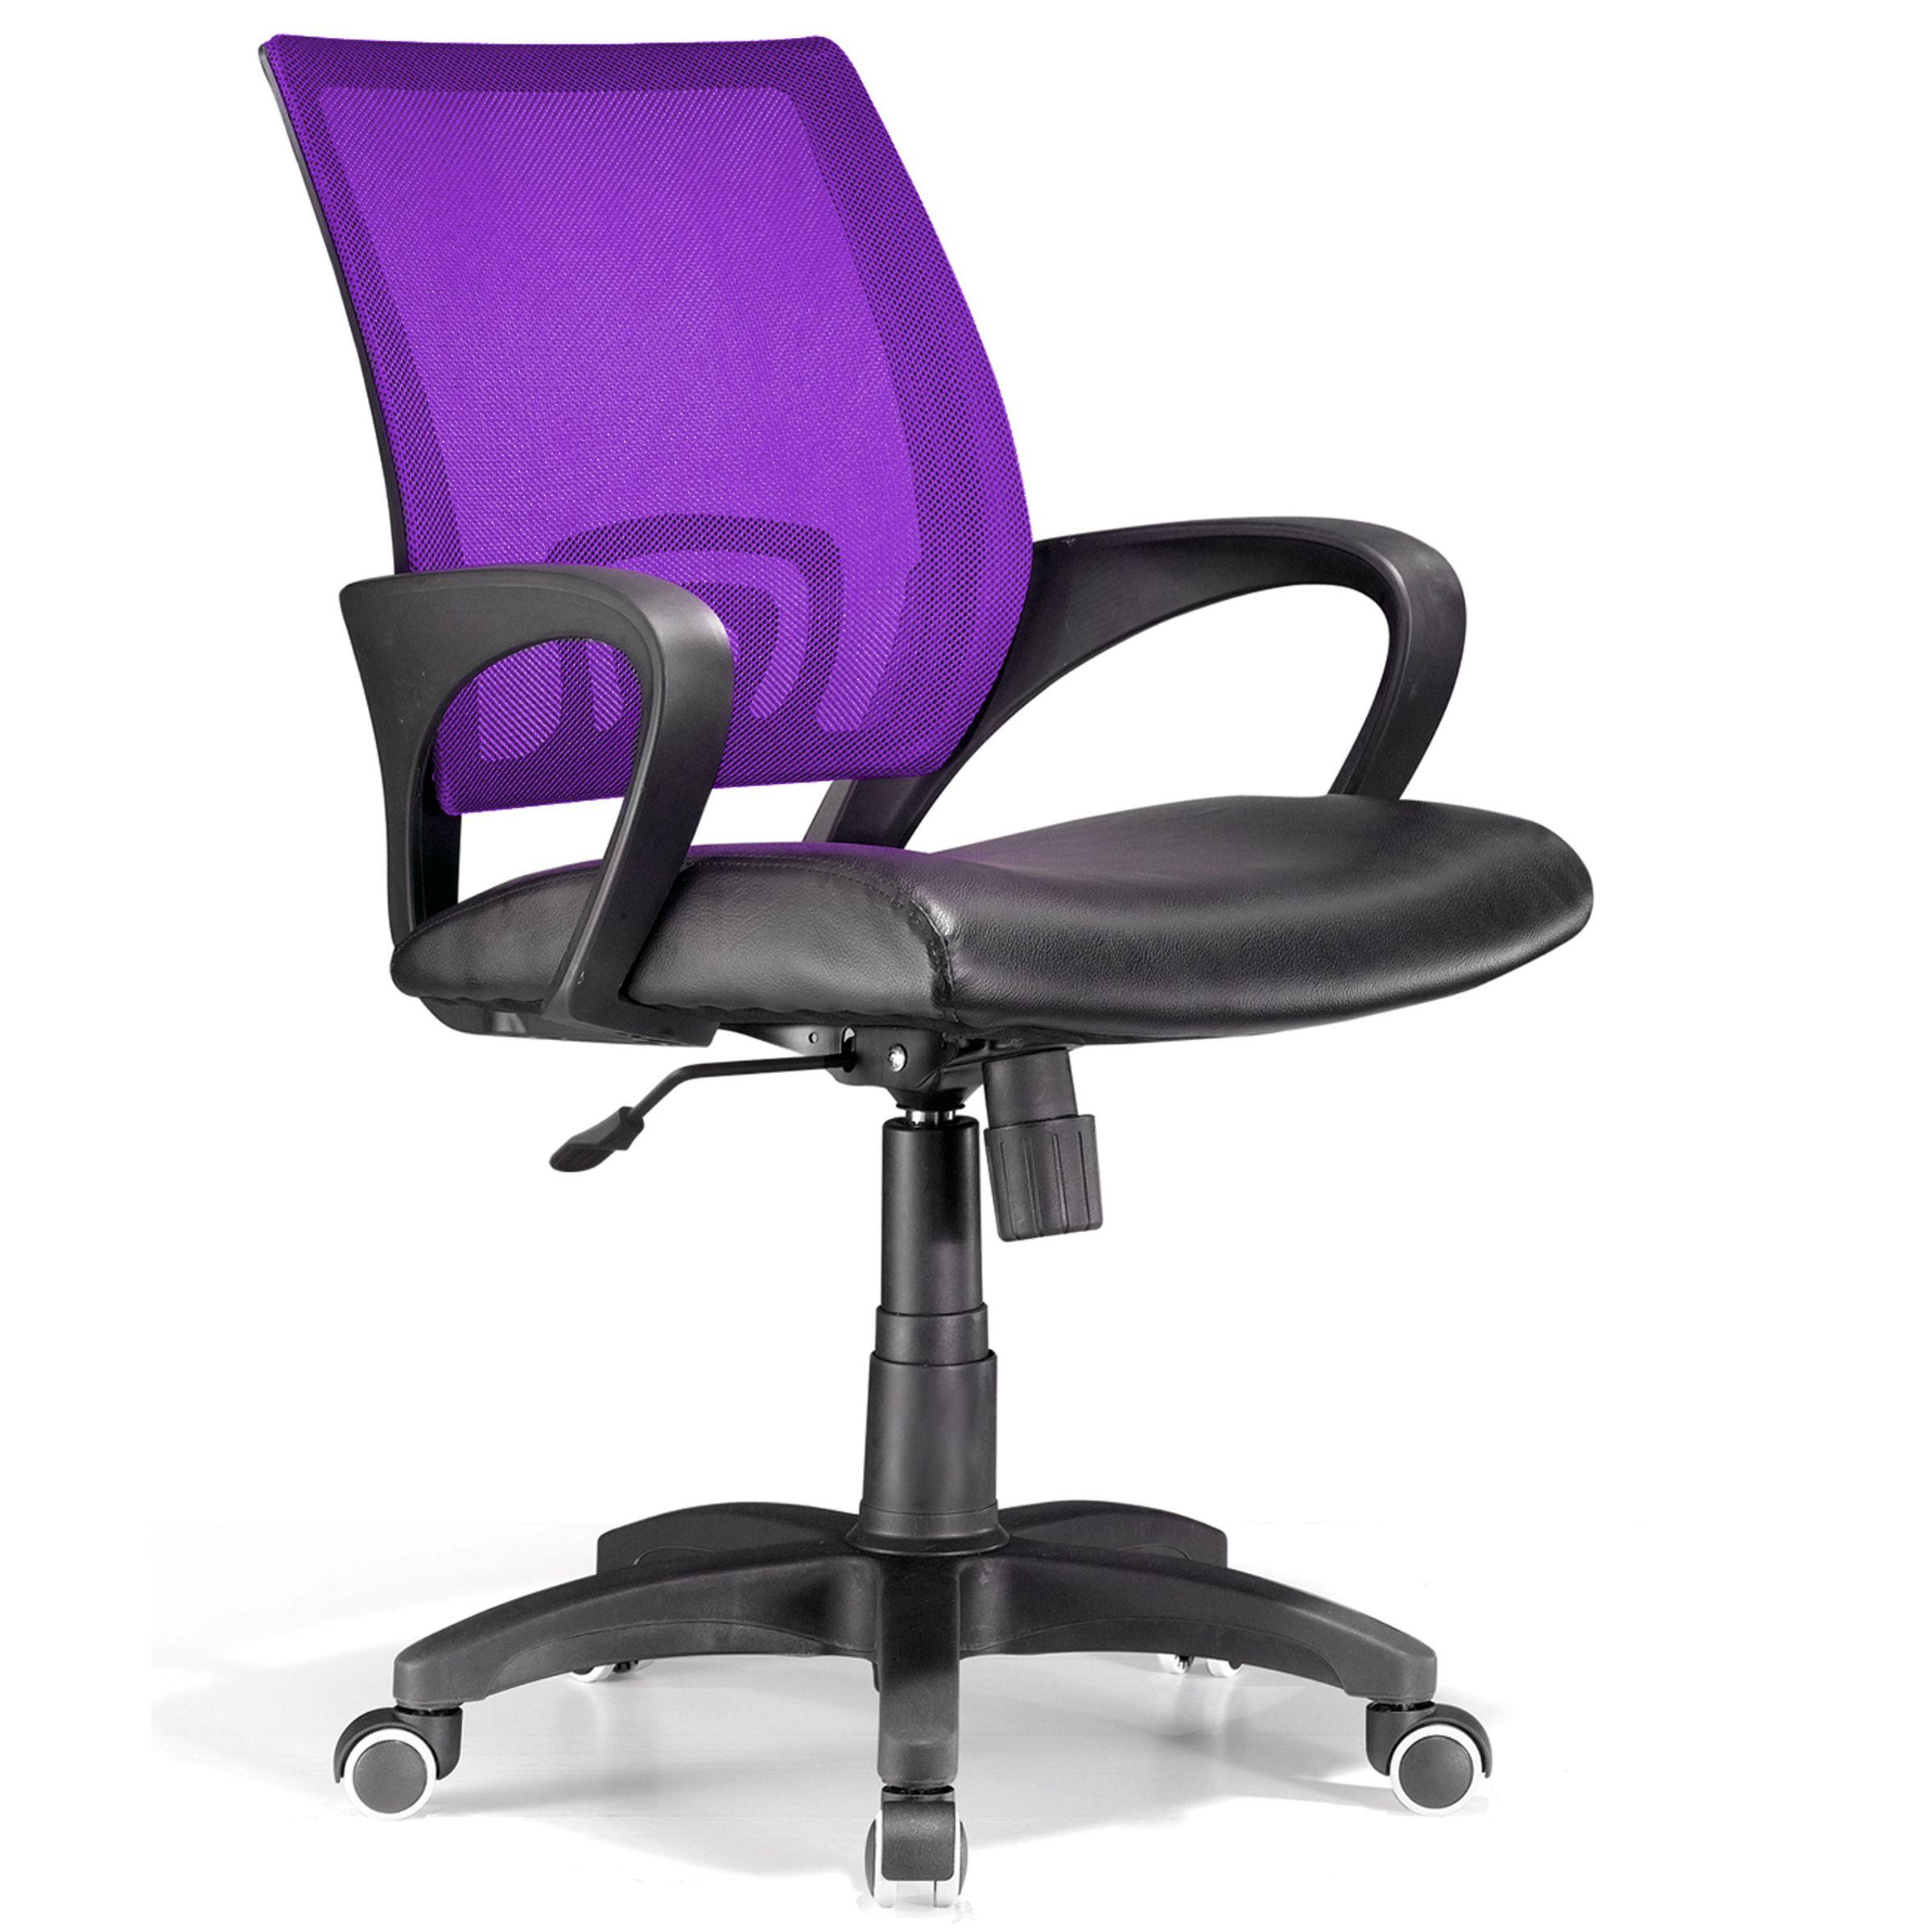 berühmte Büro Stuhl - Bürostuhl   BüroMöbel   Pinterest   Stuhl ...